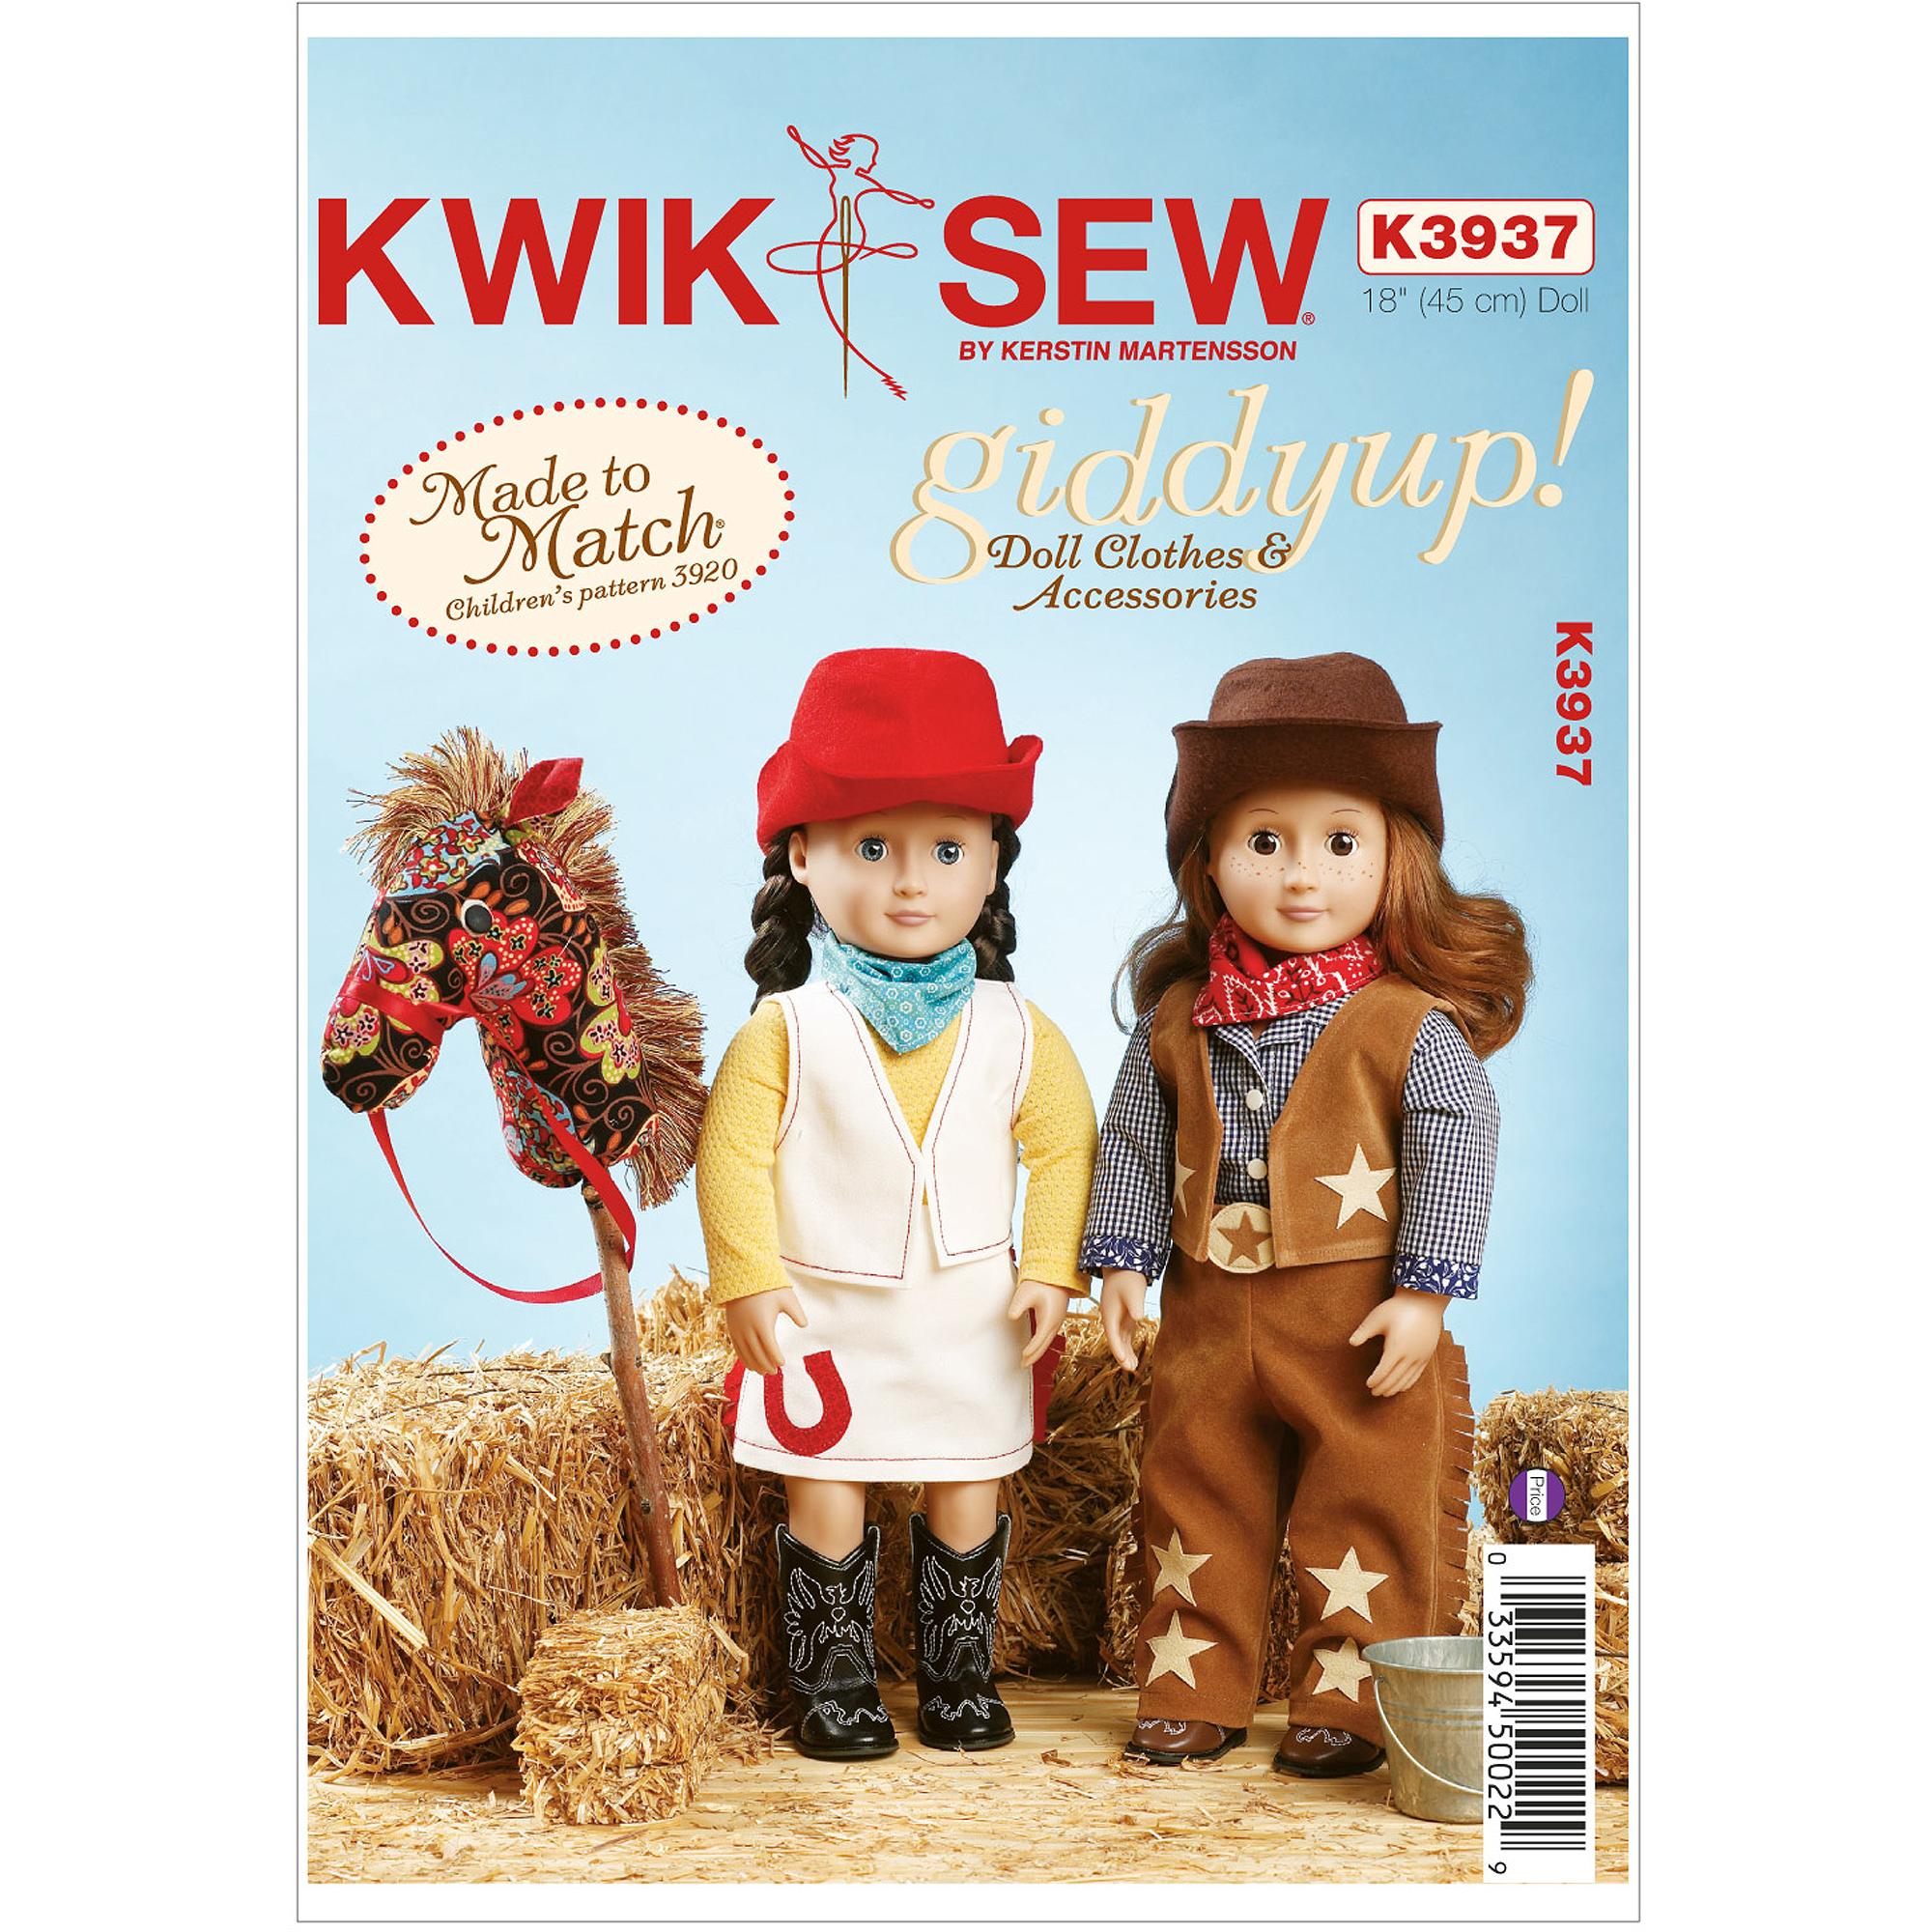 Giddyup Doll Clothes & Accessories-18 (45 cm) Doll